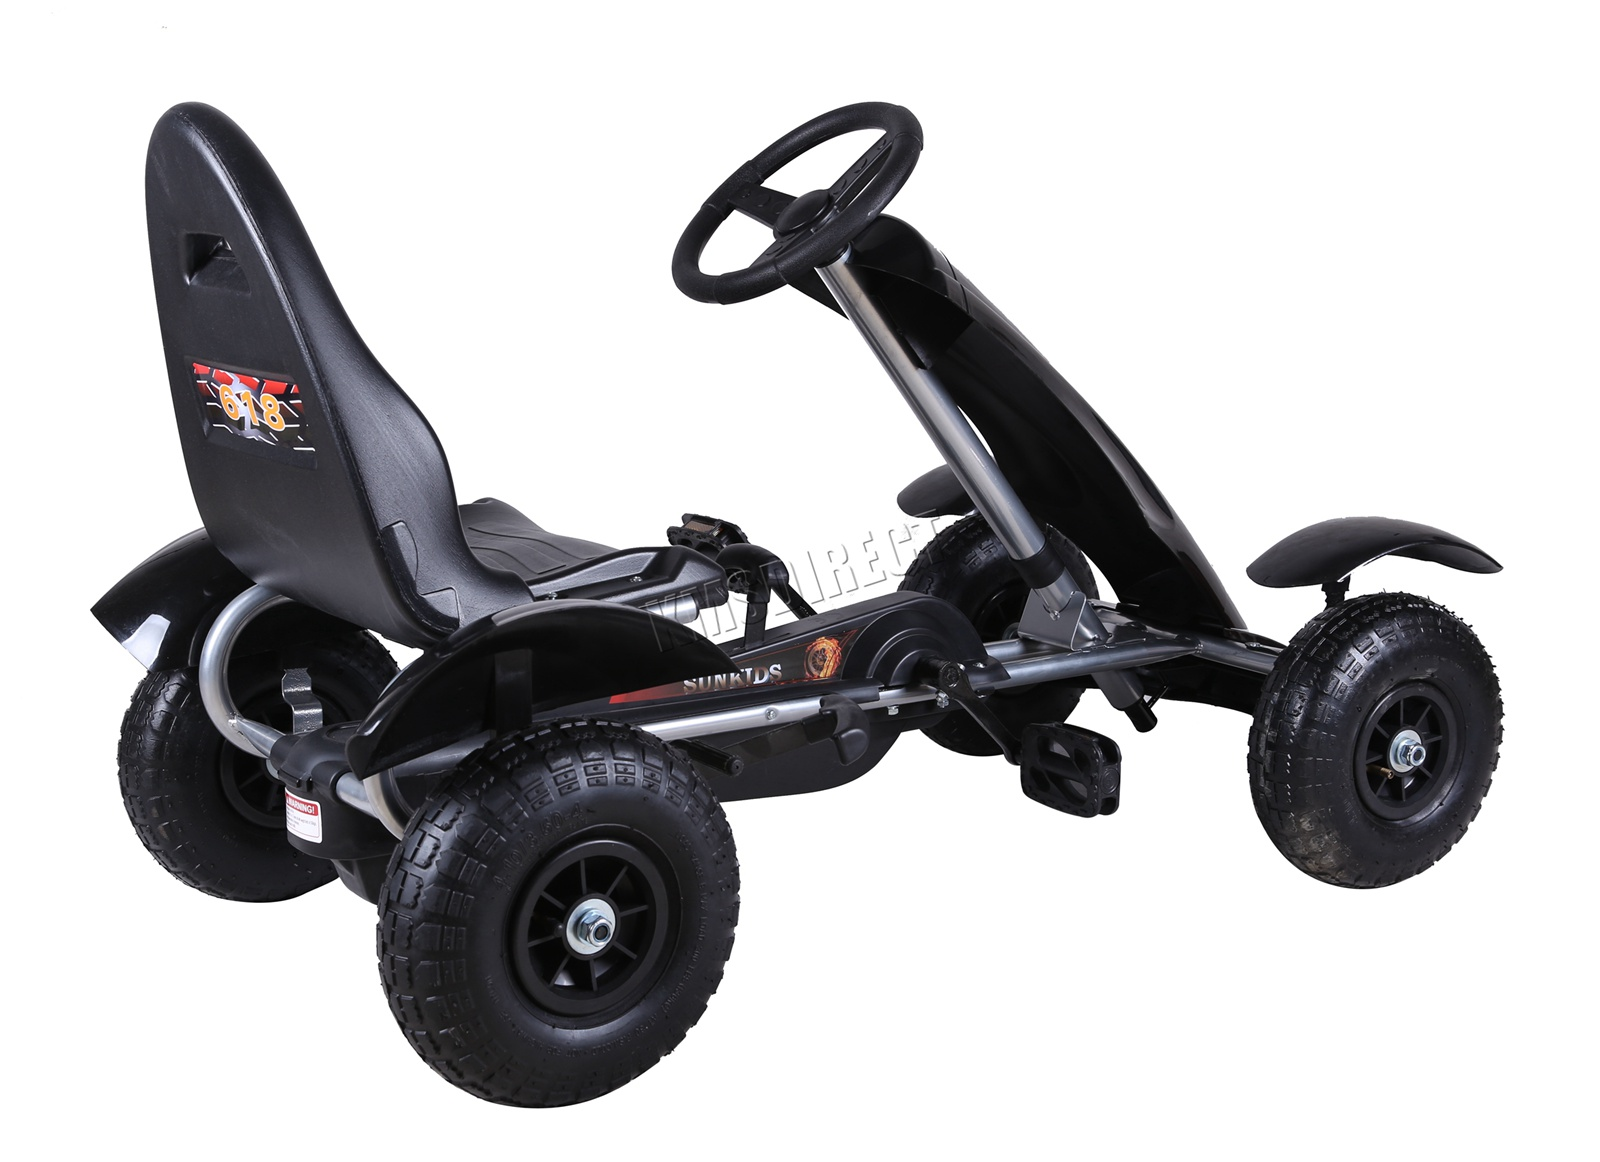 201701719267 2475 I 305 25 GOKART FH G03 BLACK KMSWM066 - Foxhunter Infantil Go Kart – Pedal Coche para Niños Gocart con Freno de Mano G03